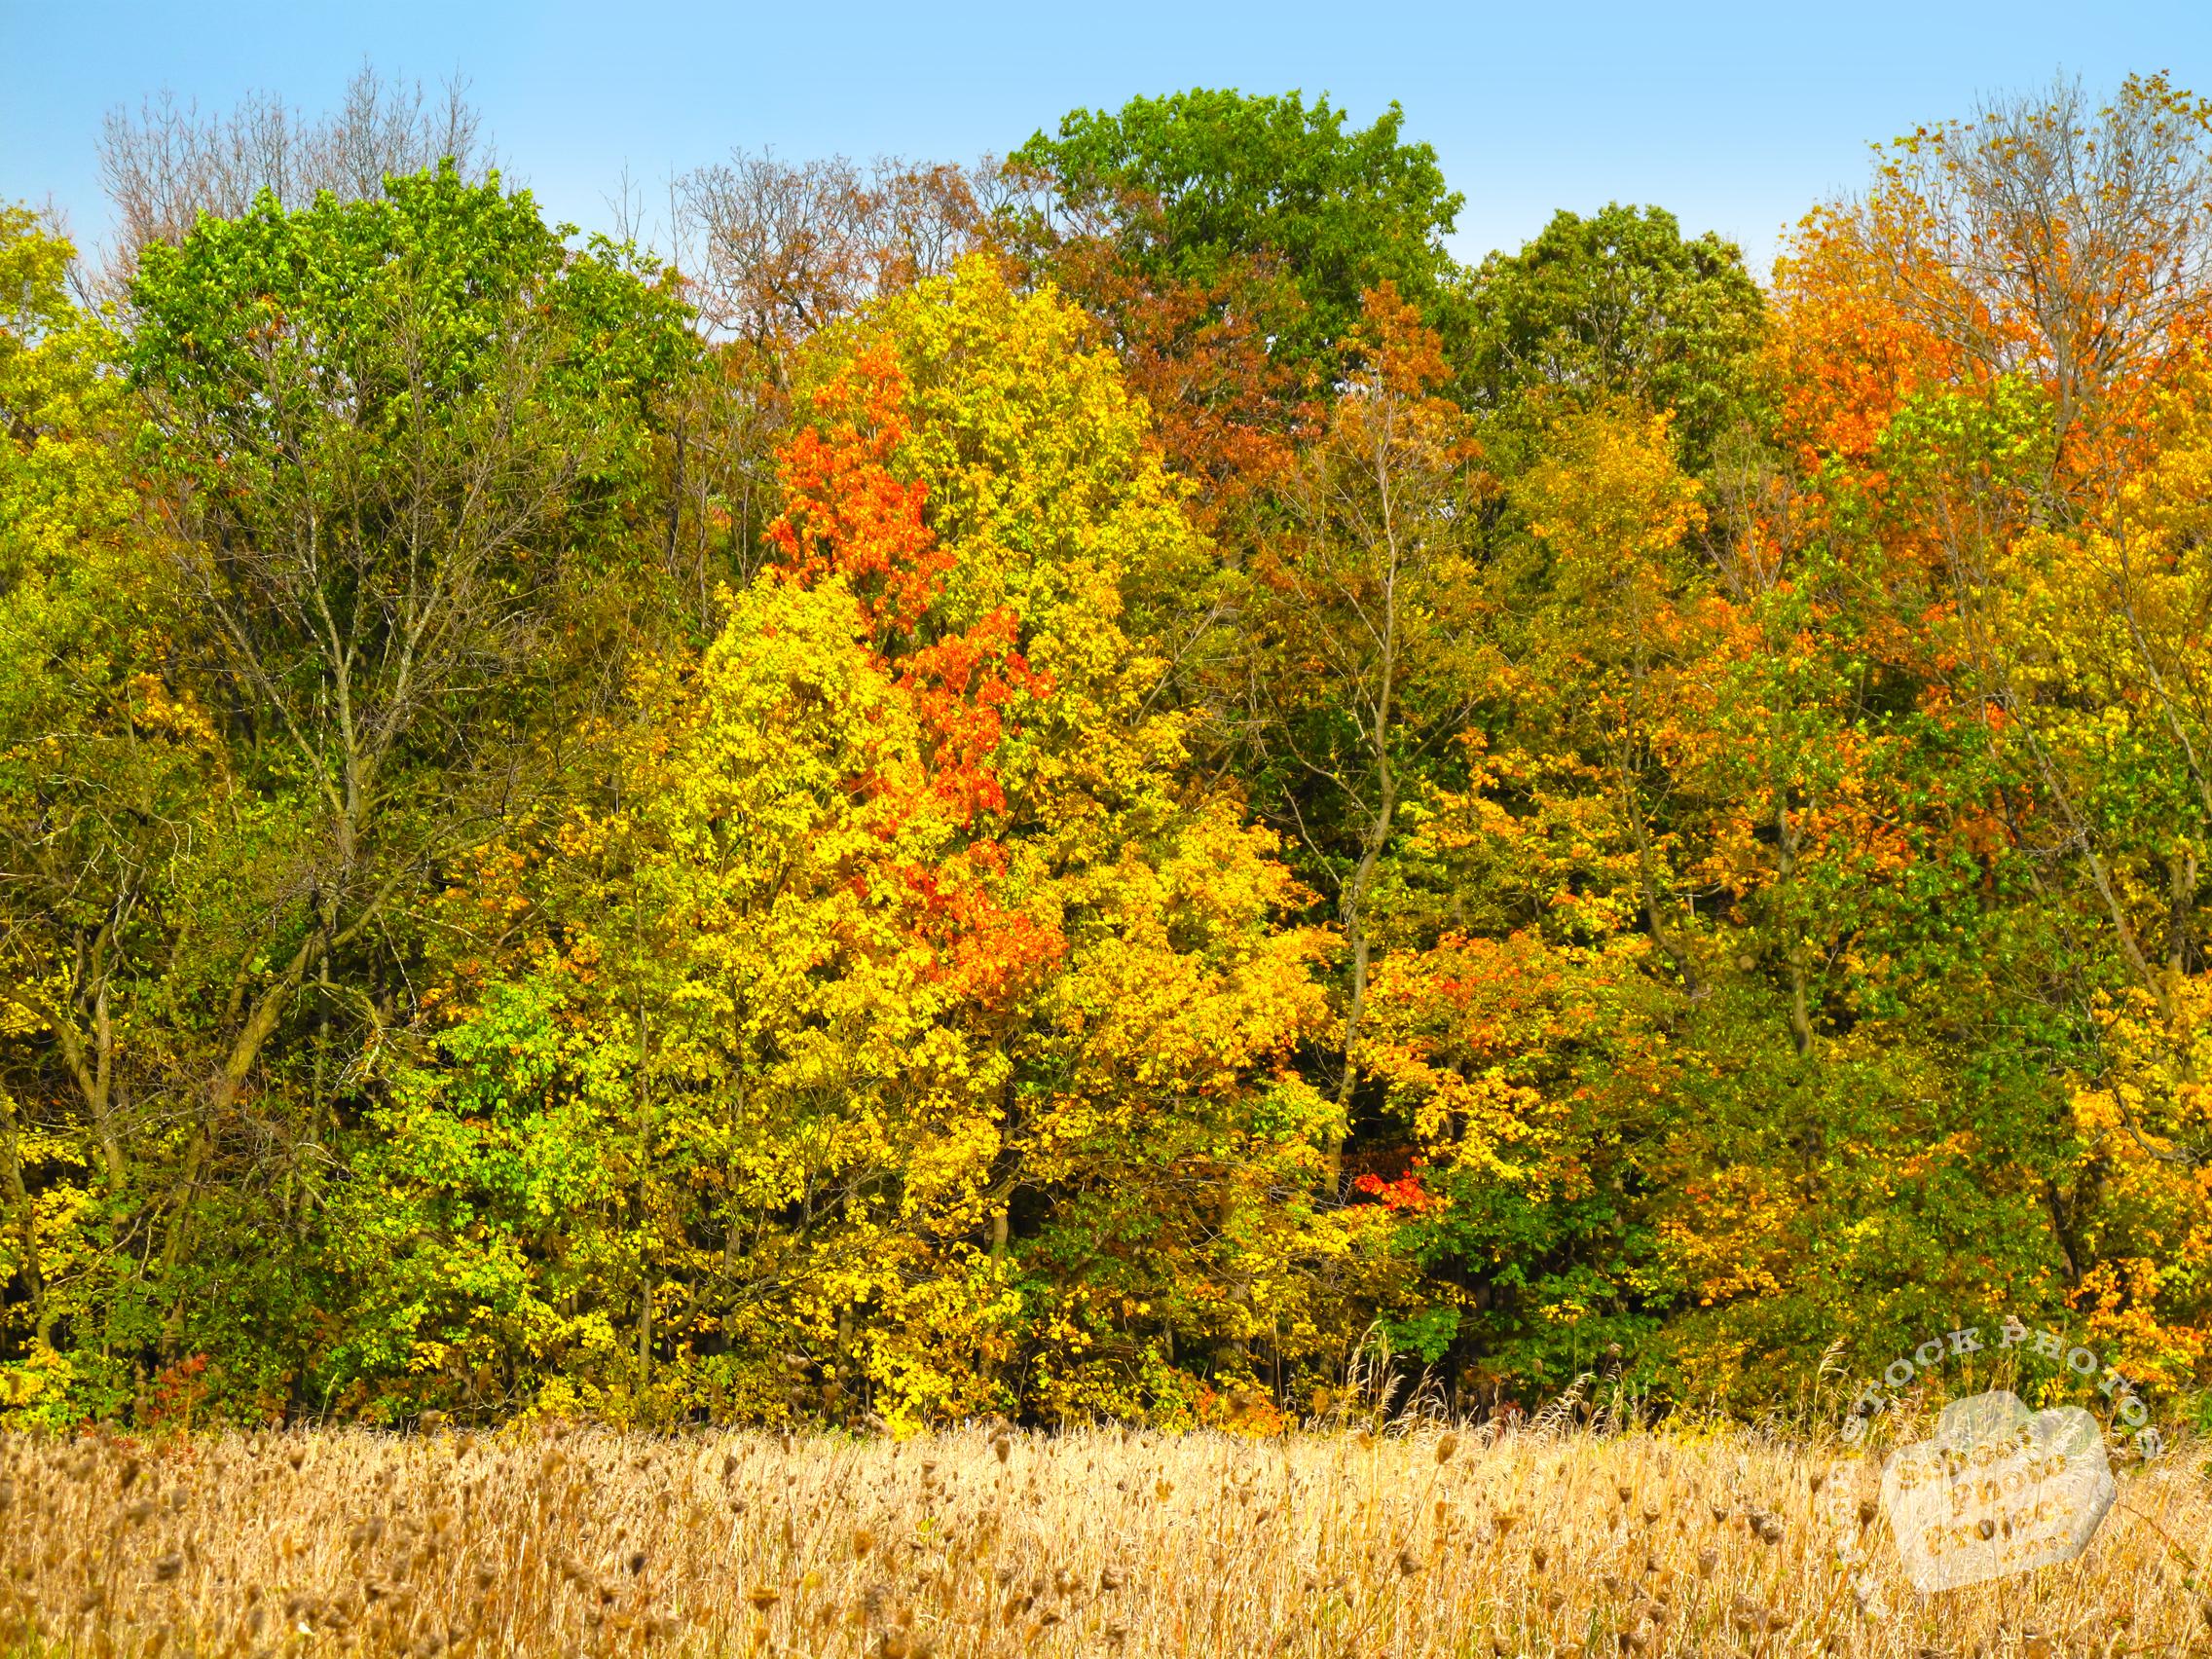 FREE Fall Foliage, Colorful Leaves Picture, Autumn Panorama Image ...